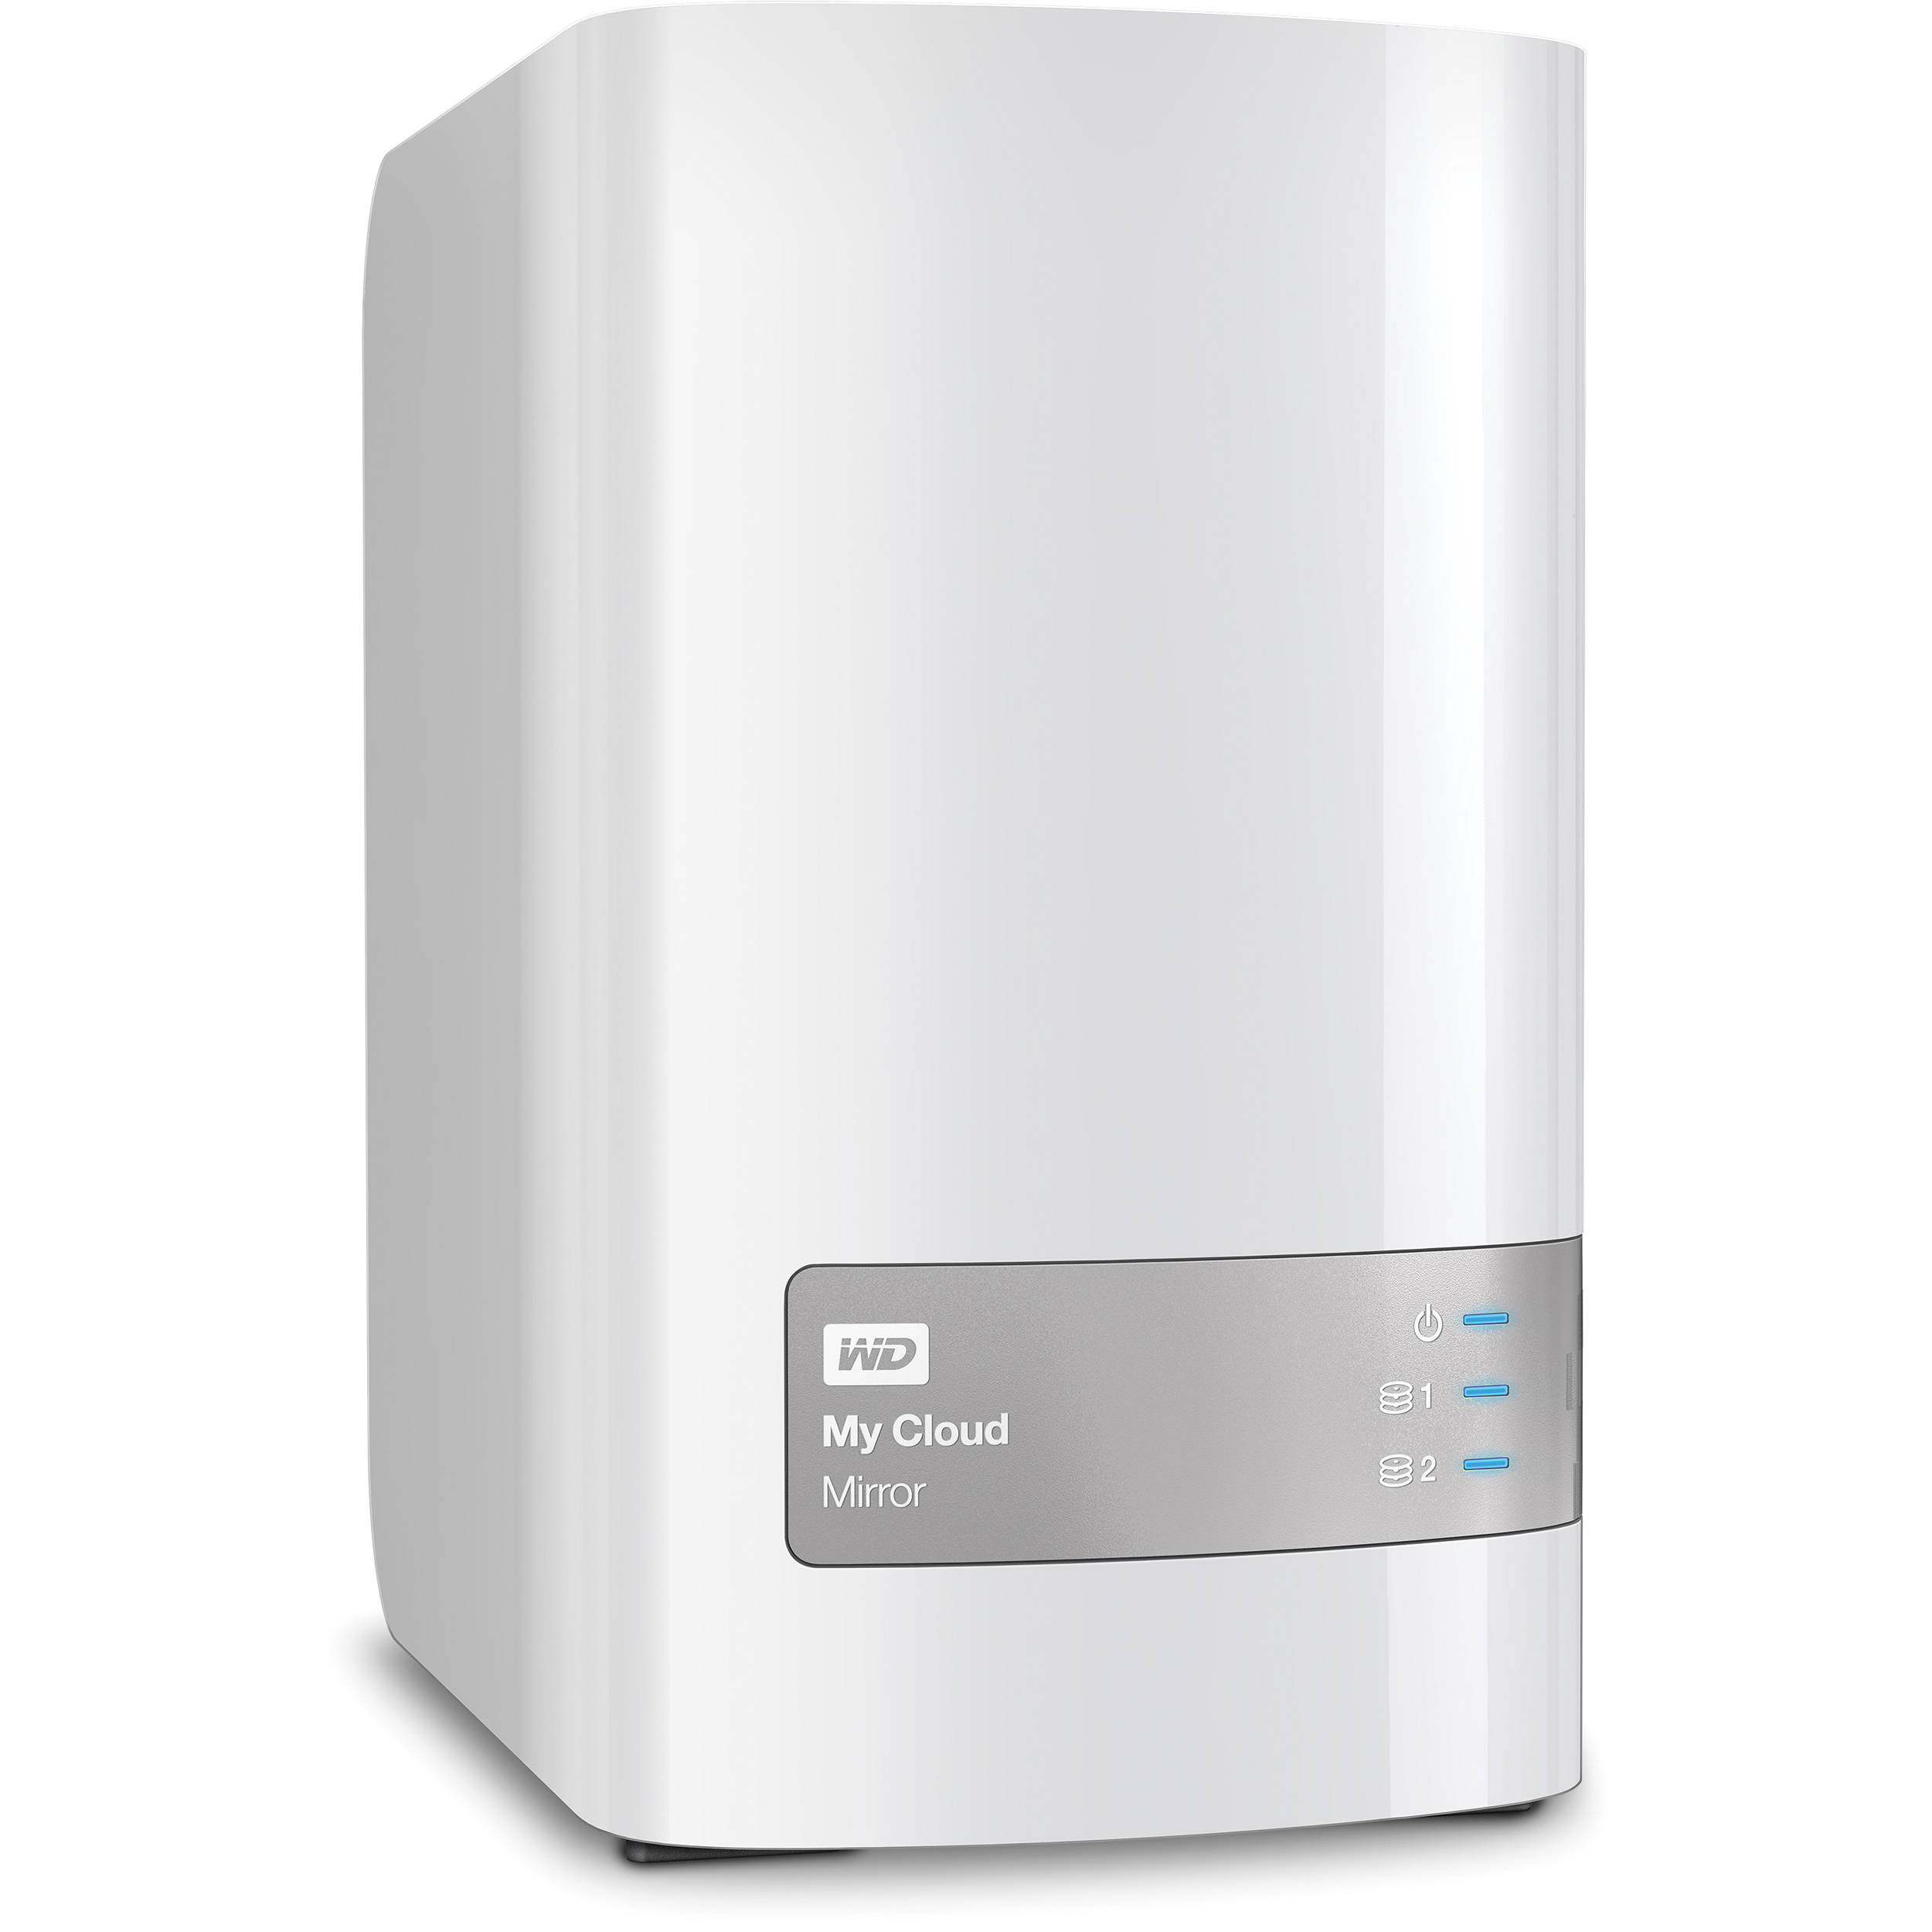 WD 4TB My Cloud Mirror External Hard Drive